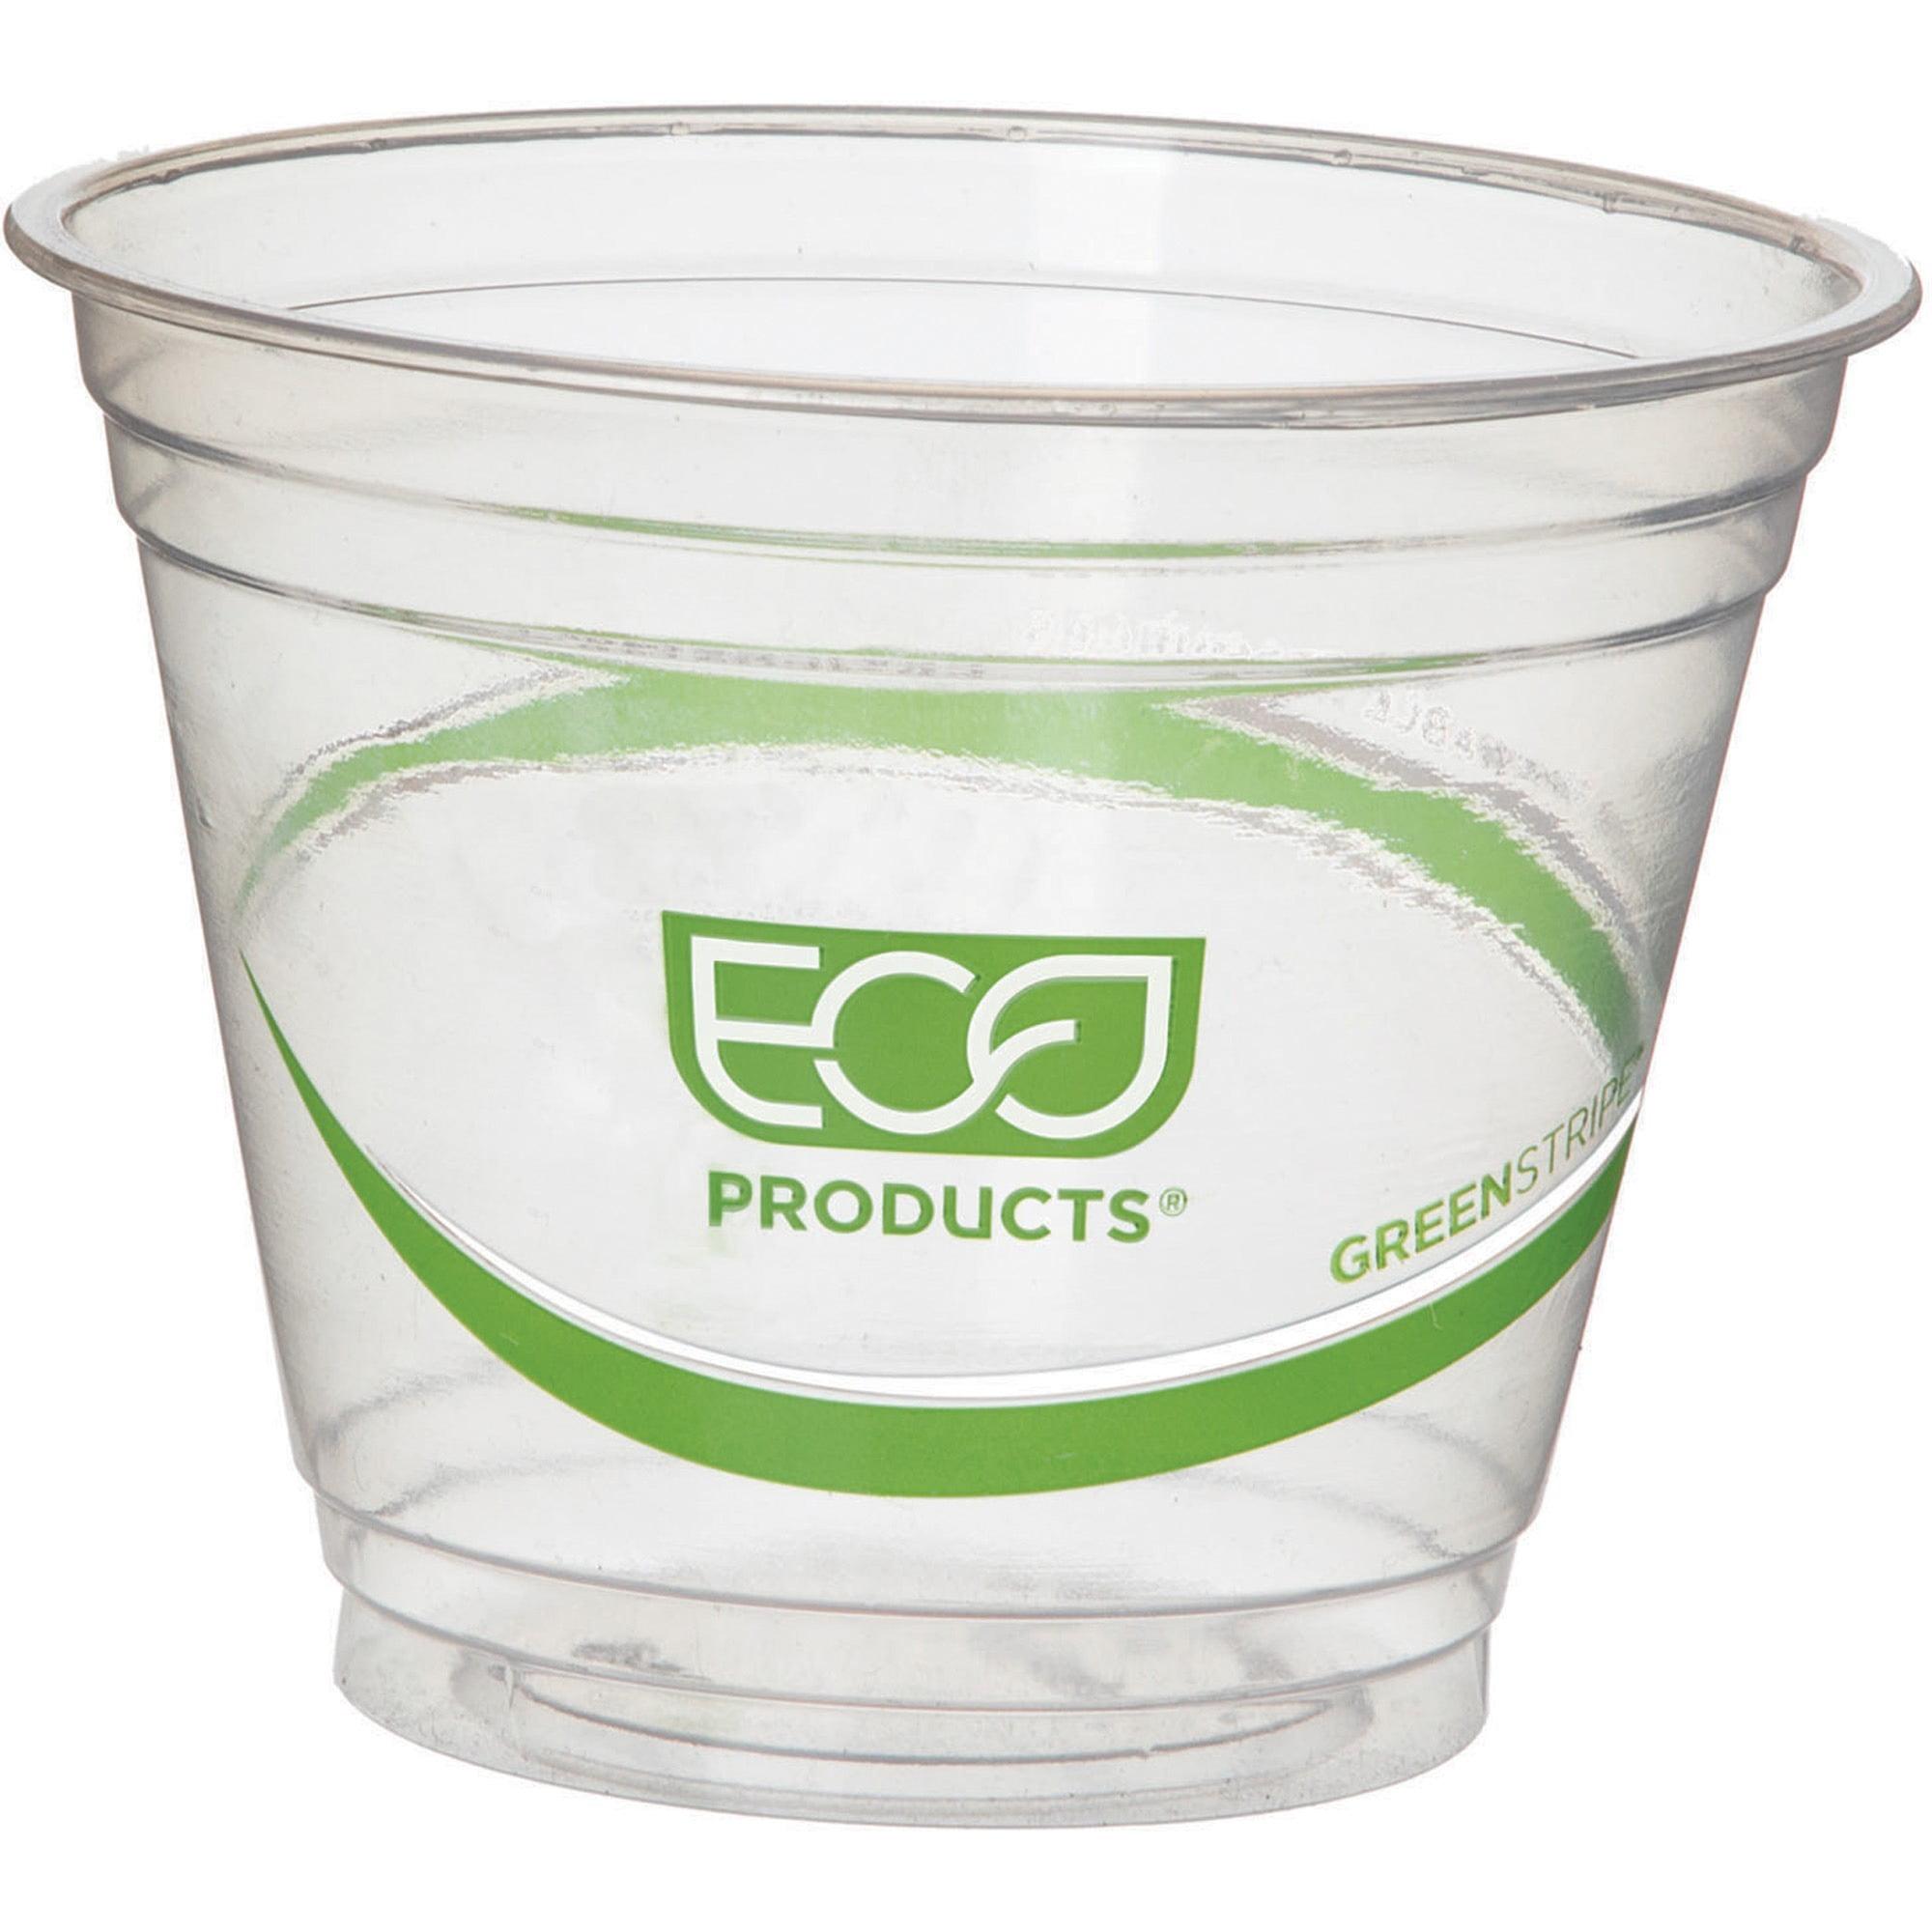 Eco-Products, ECOEPCC9SGS, GreenStripe Cold Cups, 1000 / Carton, Clear, 9 fl oz